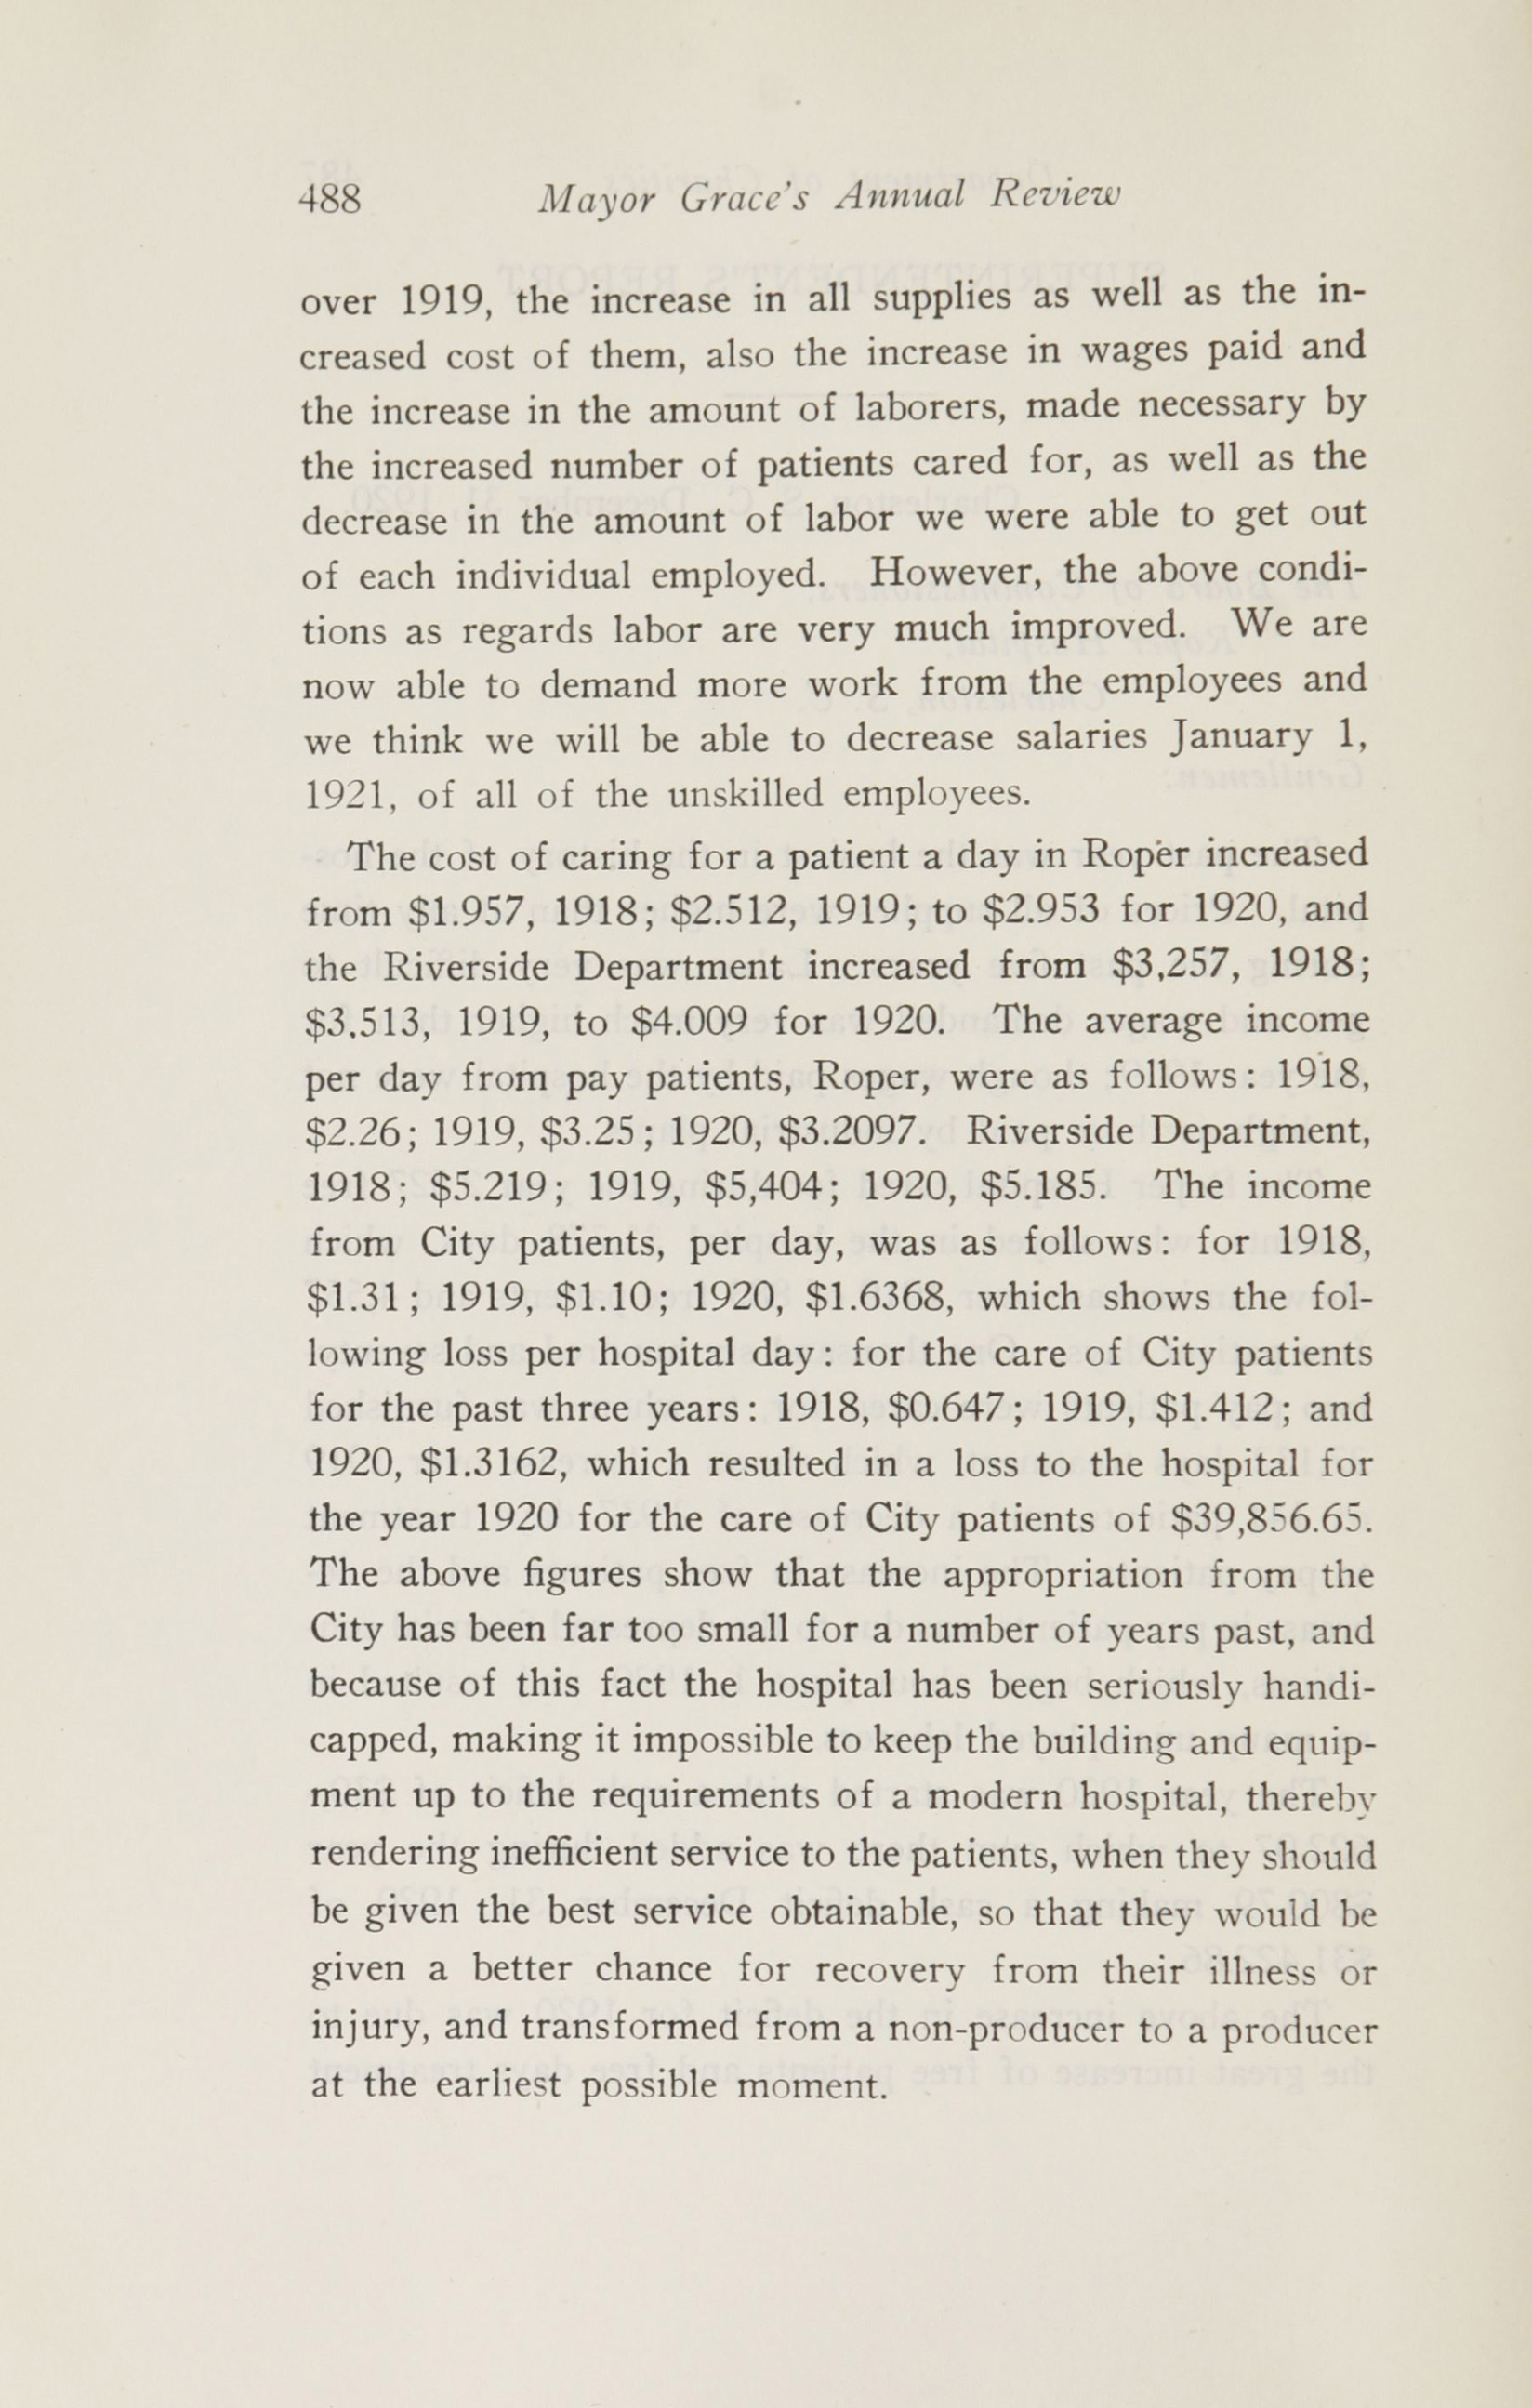 Charleston Yearbook, 1920, page 488